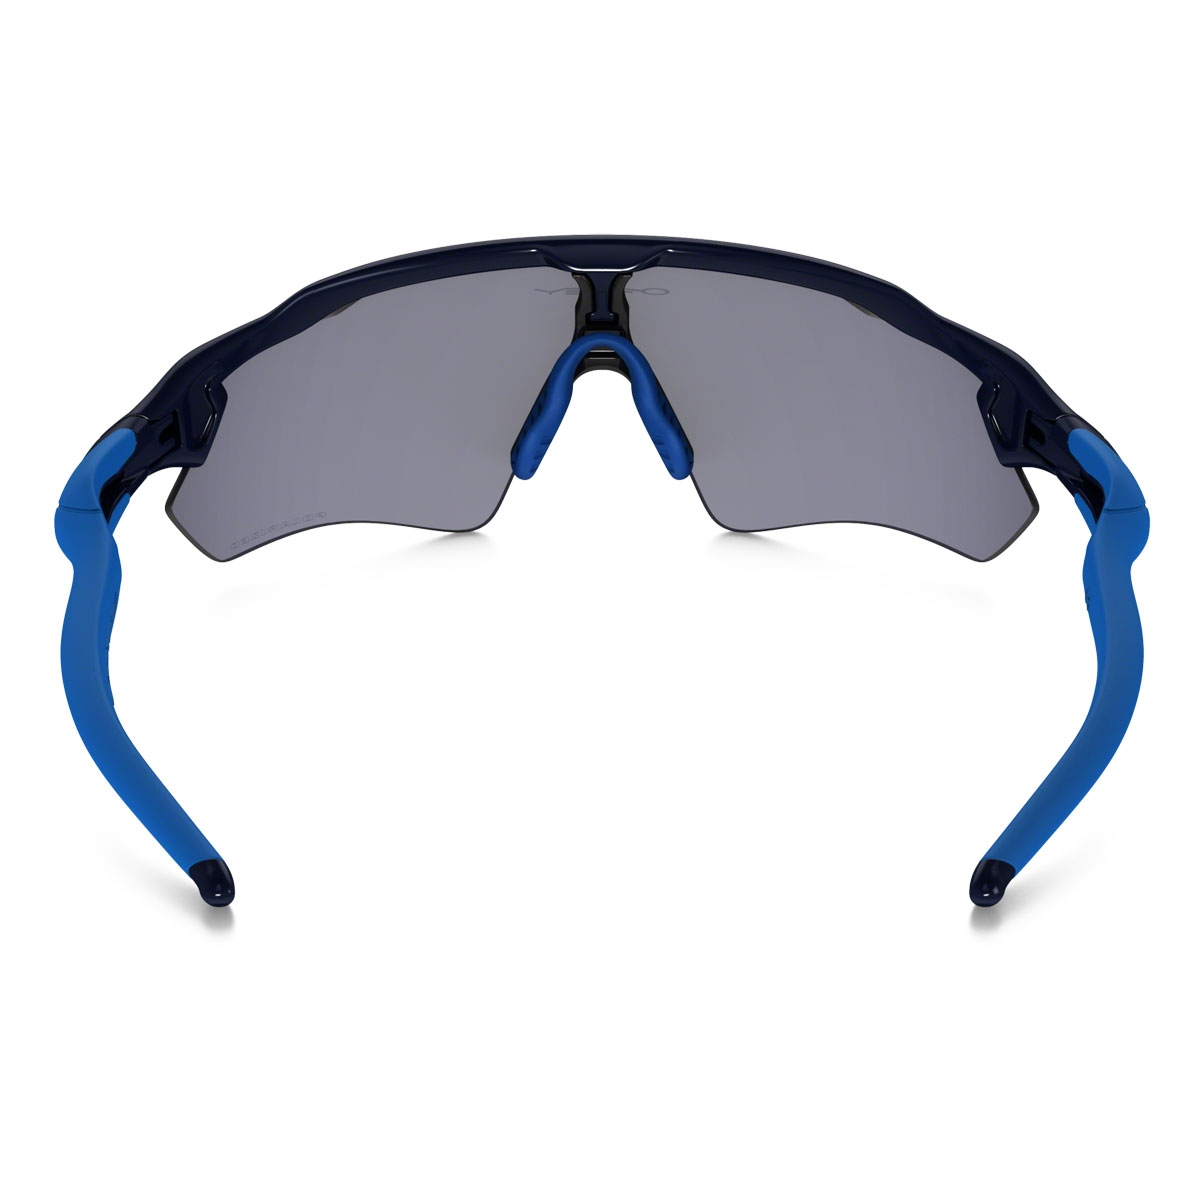 4cb6ab1990 ... Image of Oakley Radar EV Path Men s Polarized Sunglasses - Navy   Grey  Polarized ...